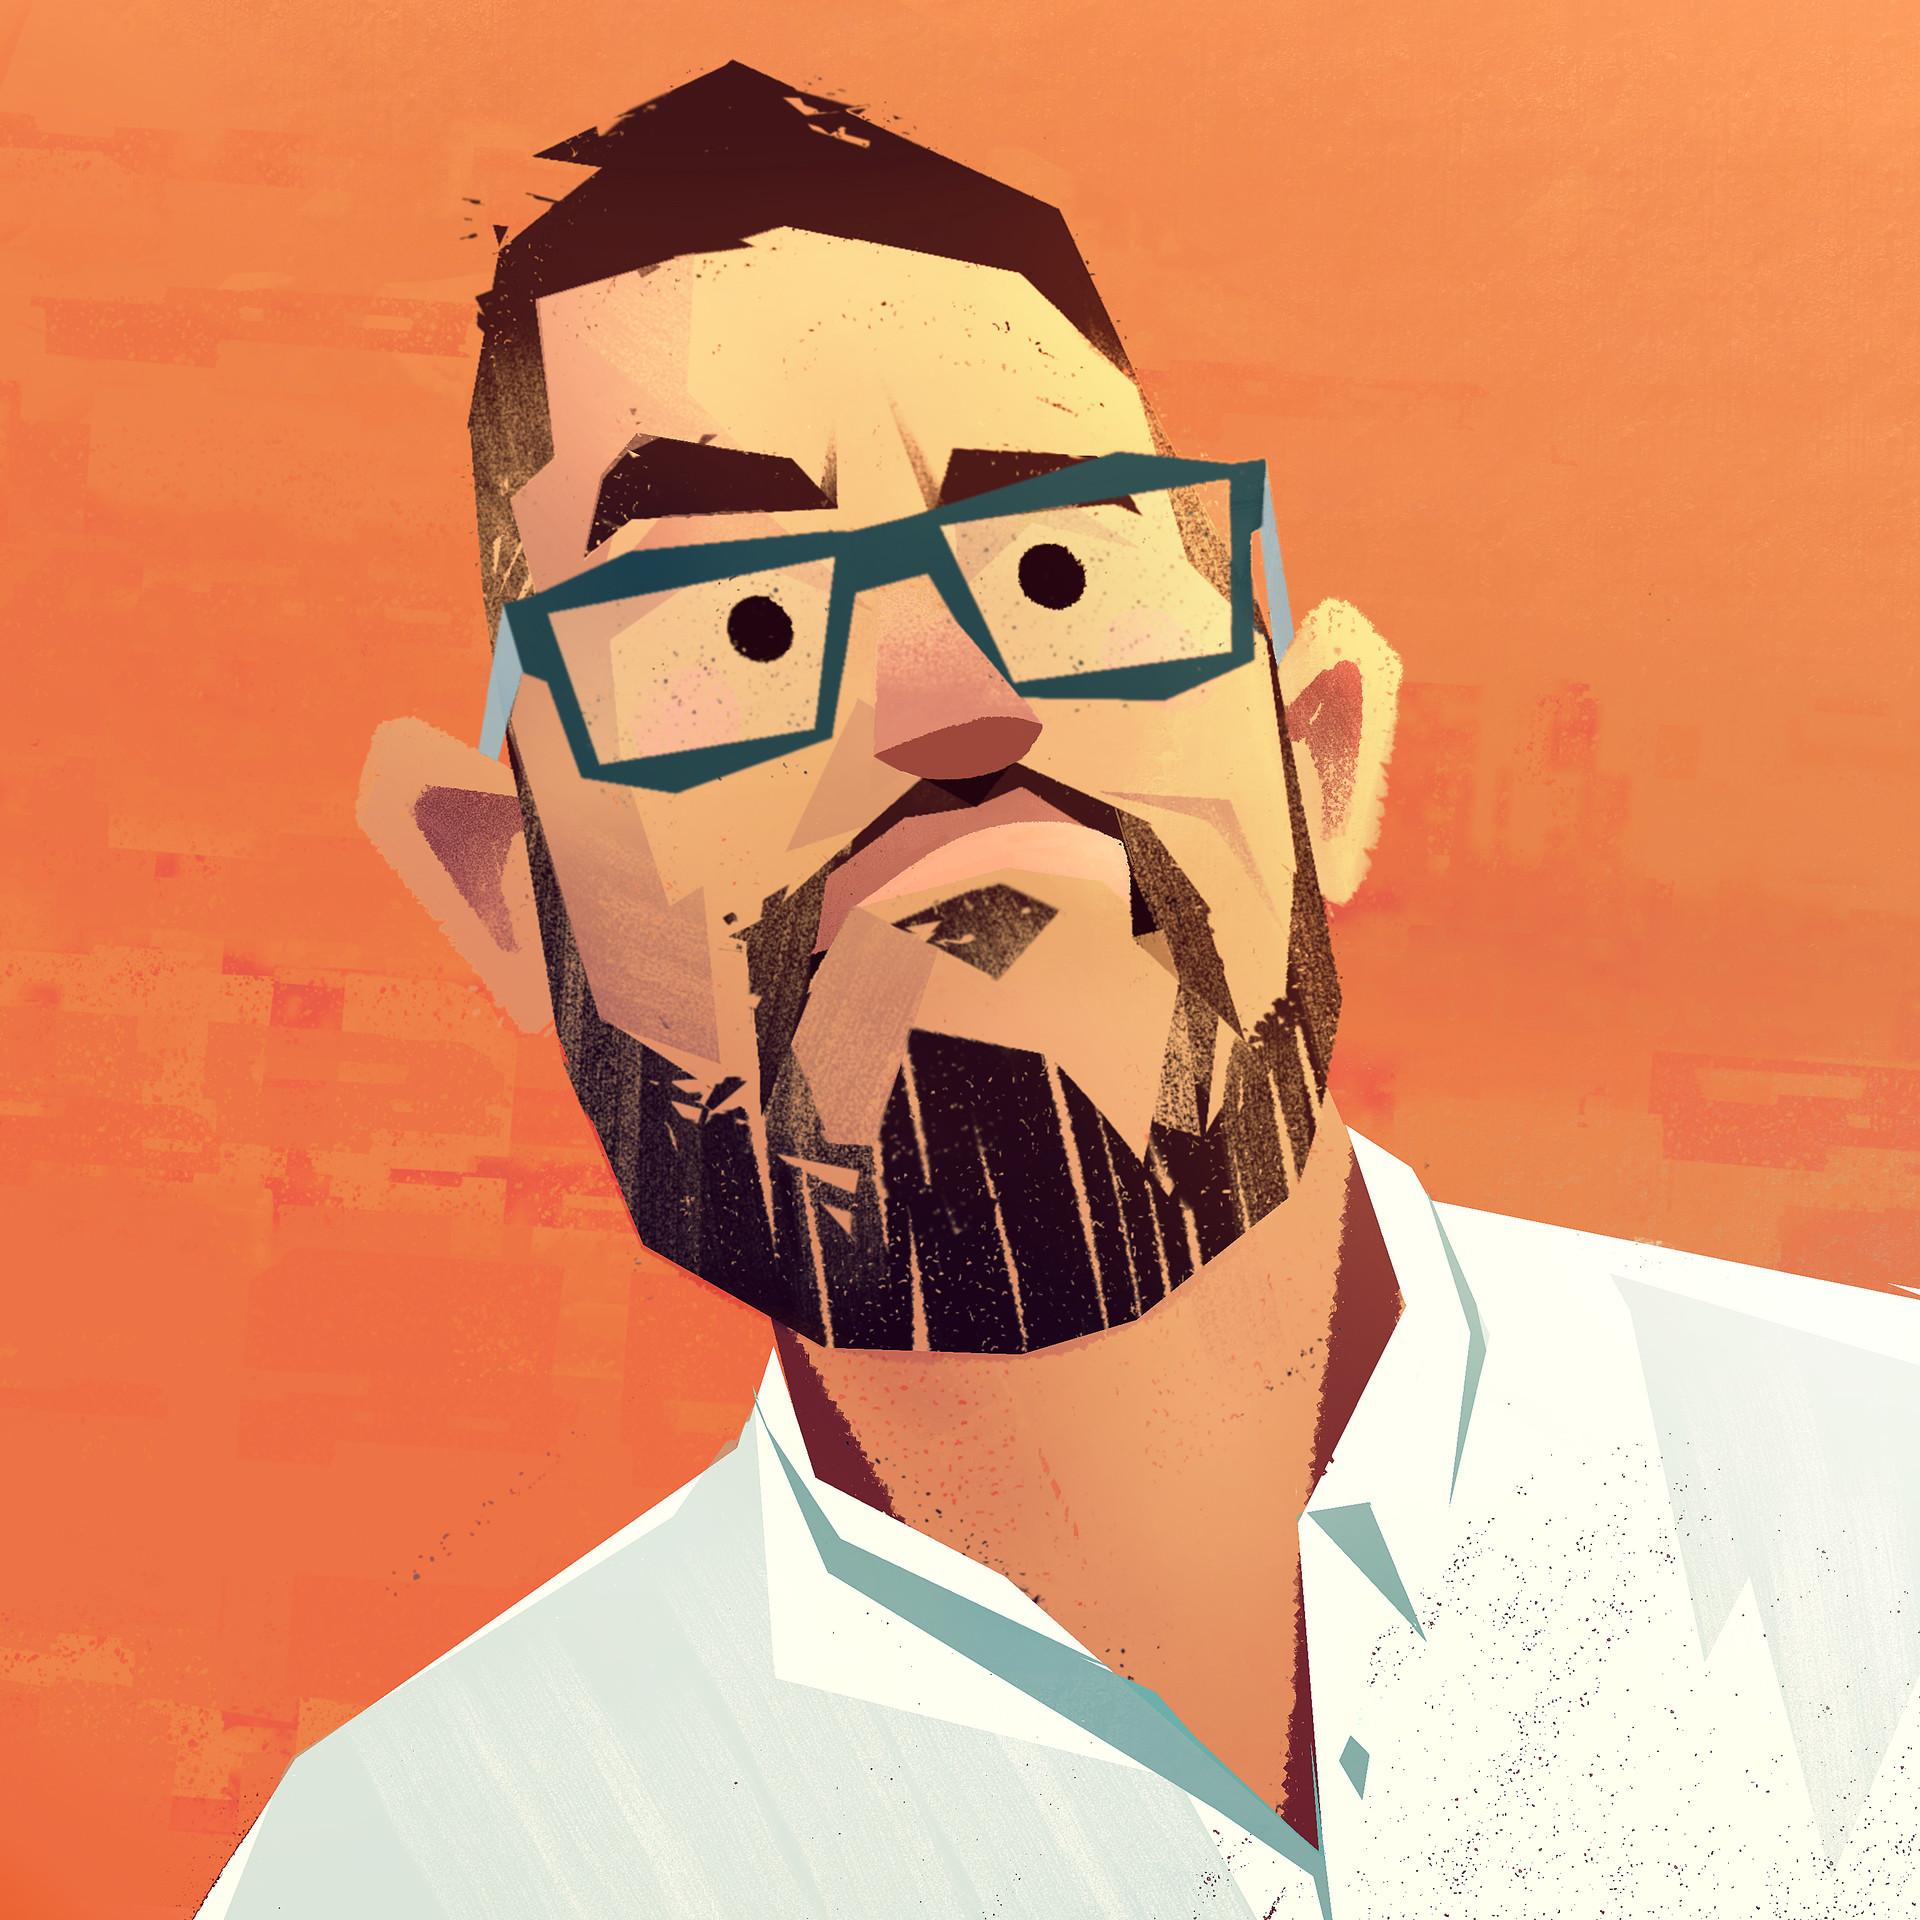 Mike mccain avatar post